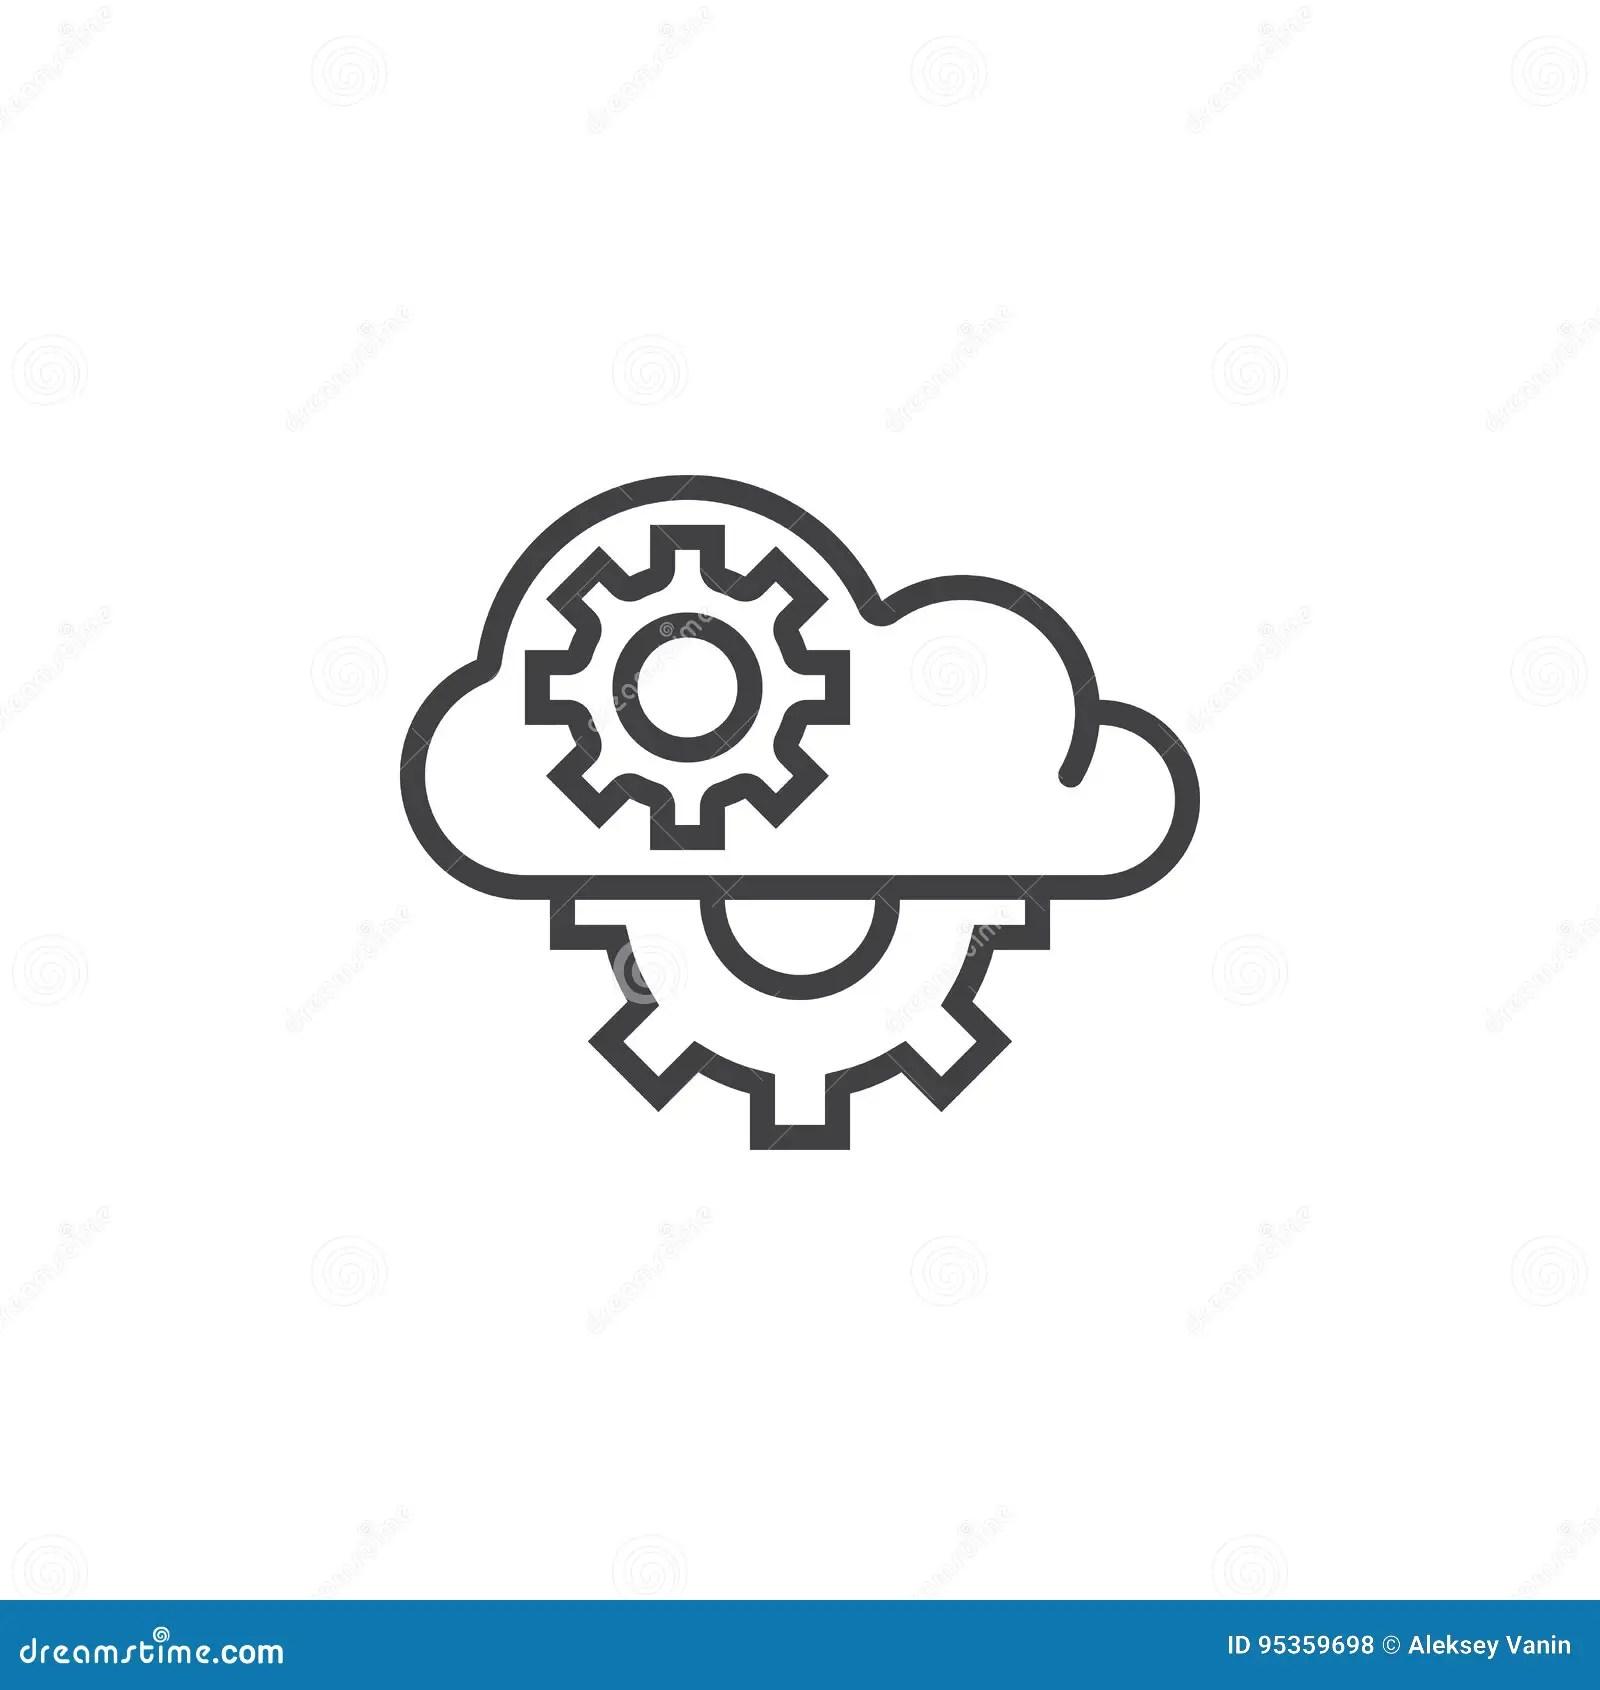 Cloud Computing Gears Cartoon Vector